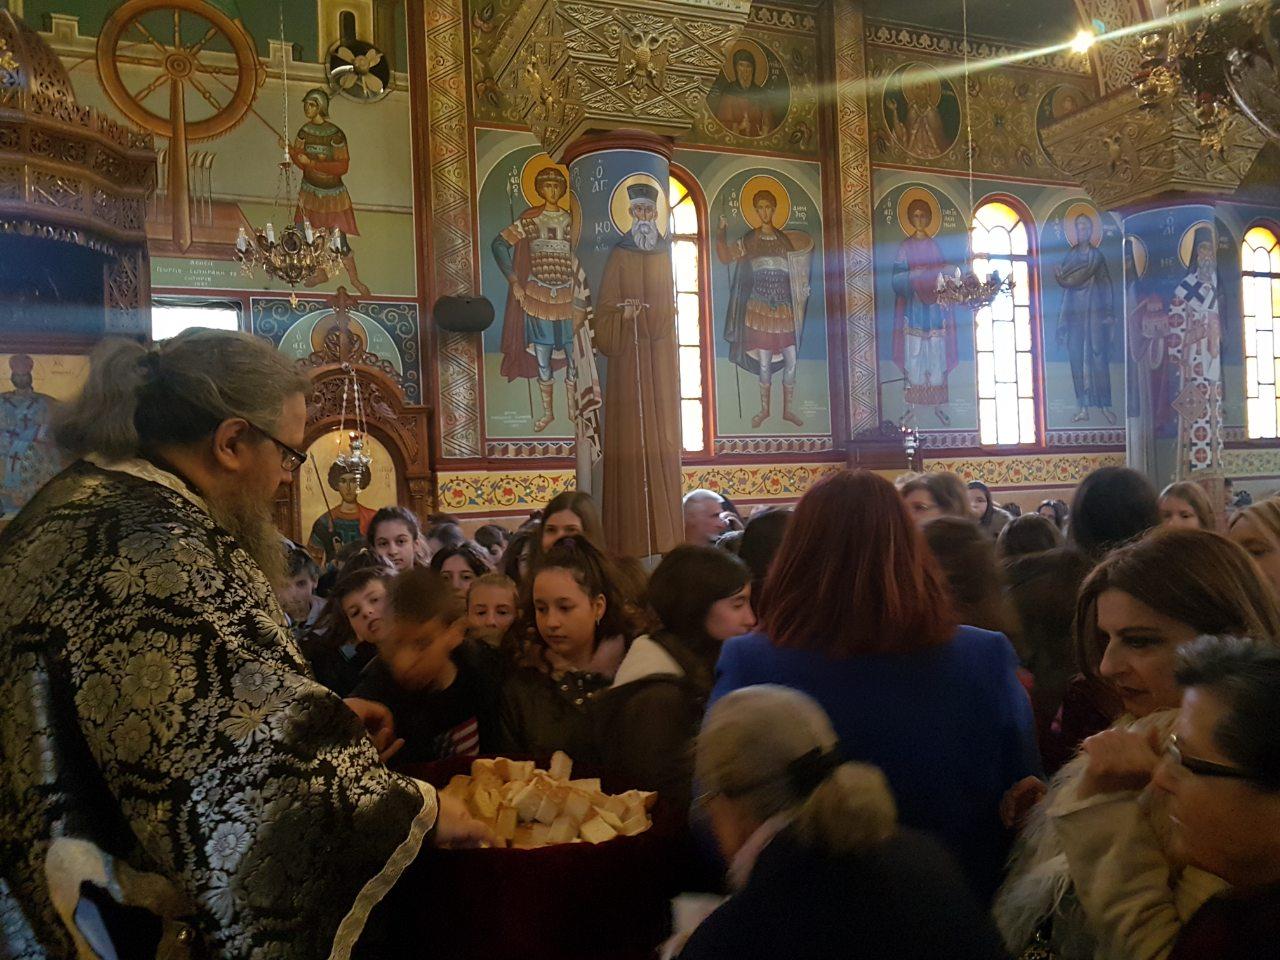 prohgiasmenh giannouli 6 - Ο Σεβασμιώτατος στον Ι.Ν. Αγίου Γεωργίου Γιάννουλης